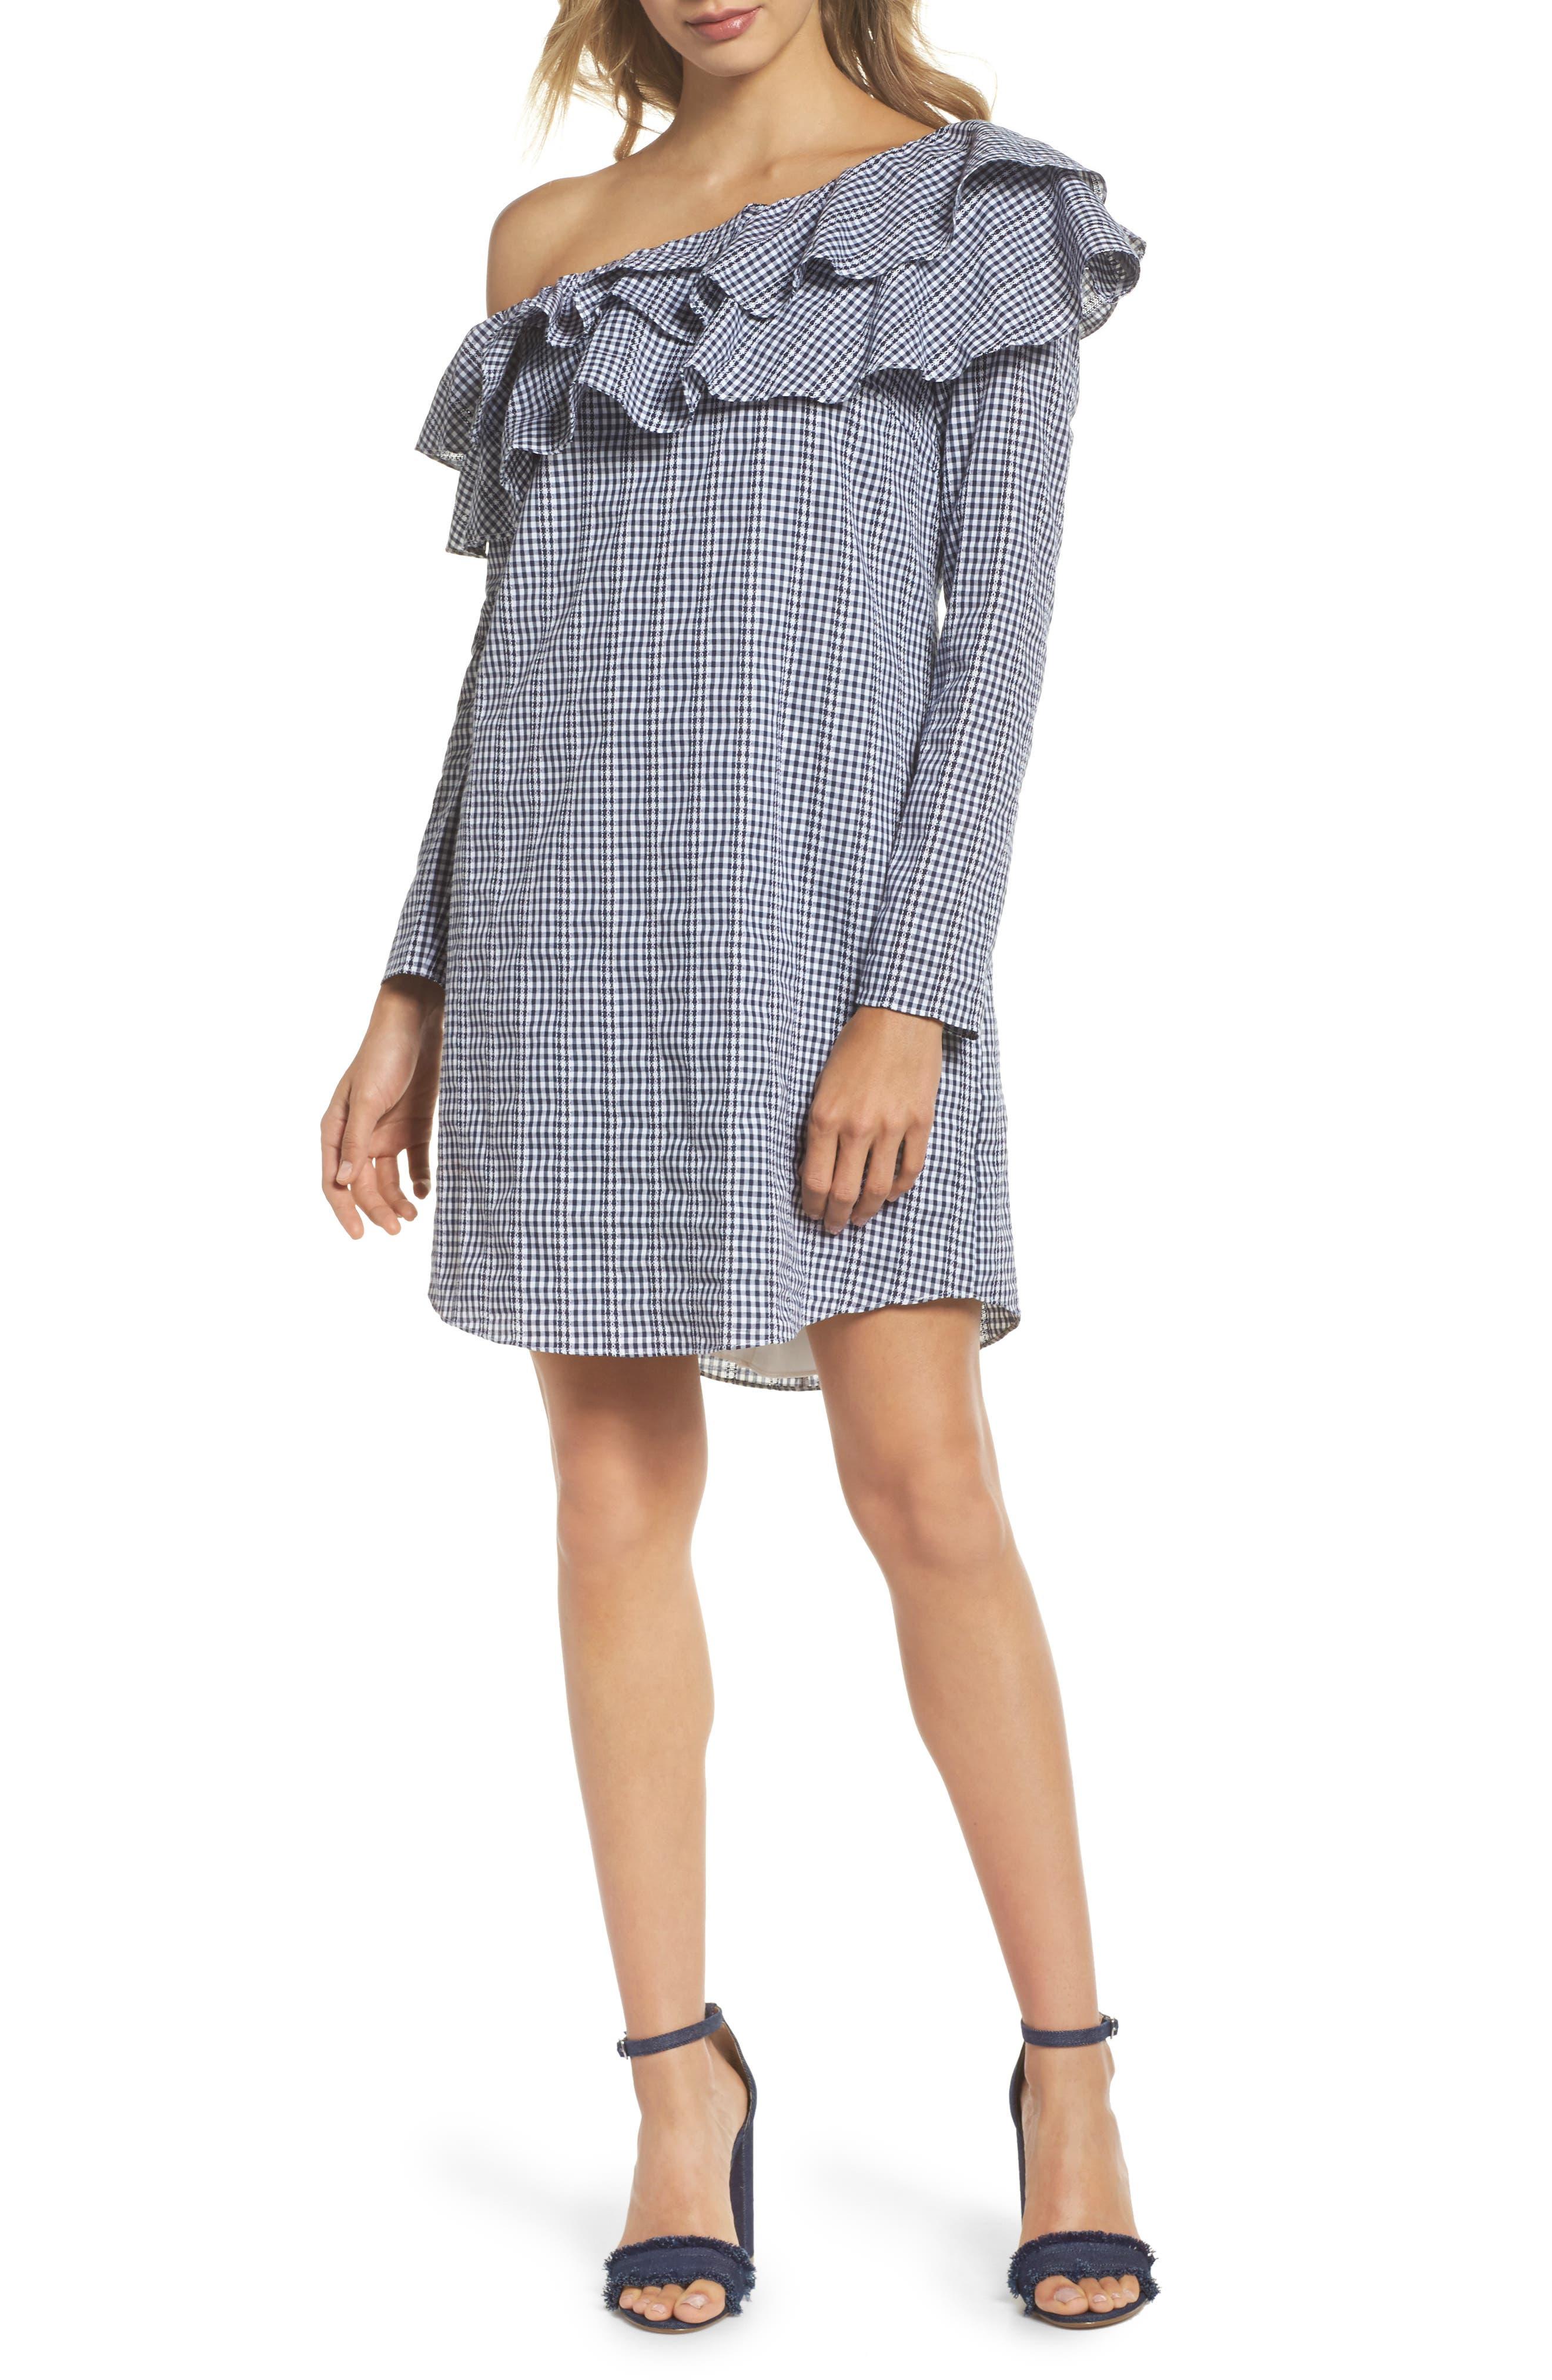 ADELYN RAE Gingham One-Shoulder Ruffle Dress, Main, color, 410